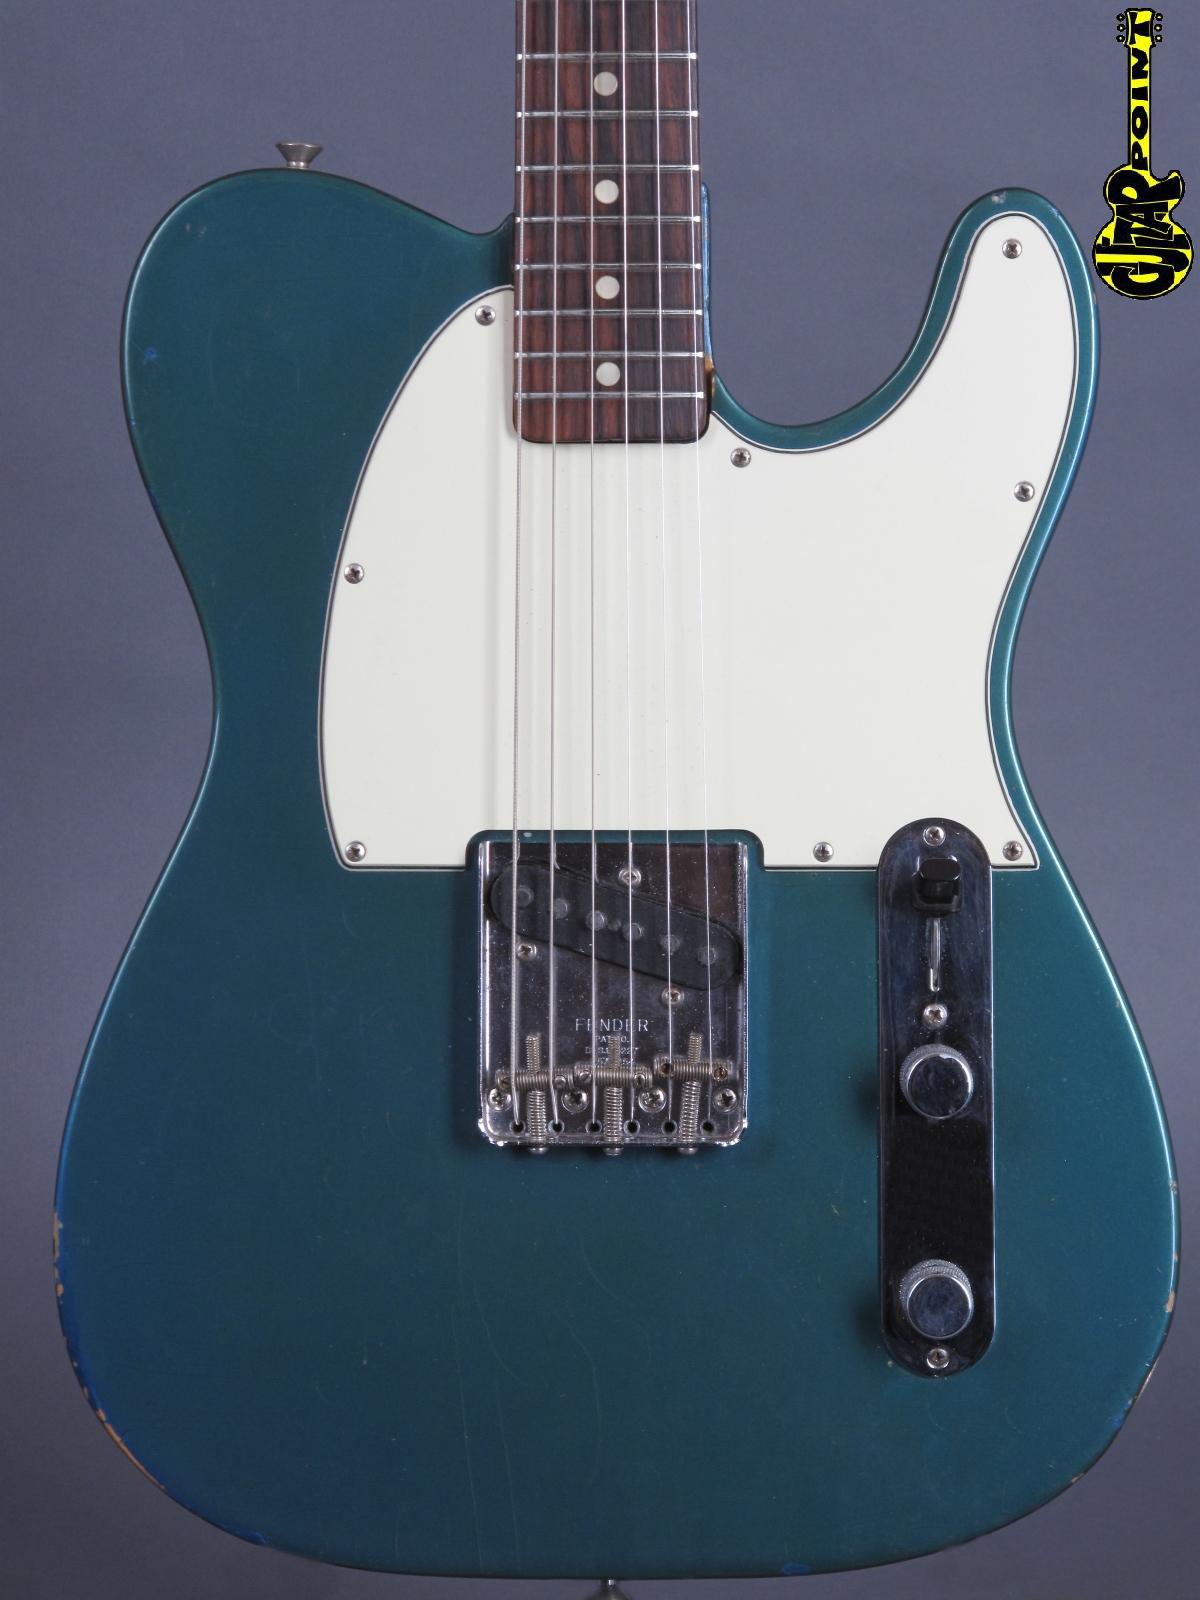 1966 Fender Esquire - Lake Placid Blue